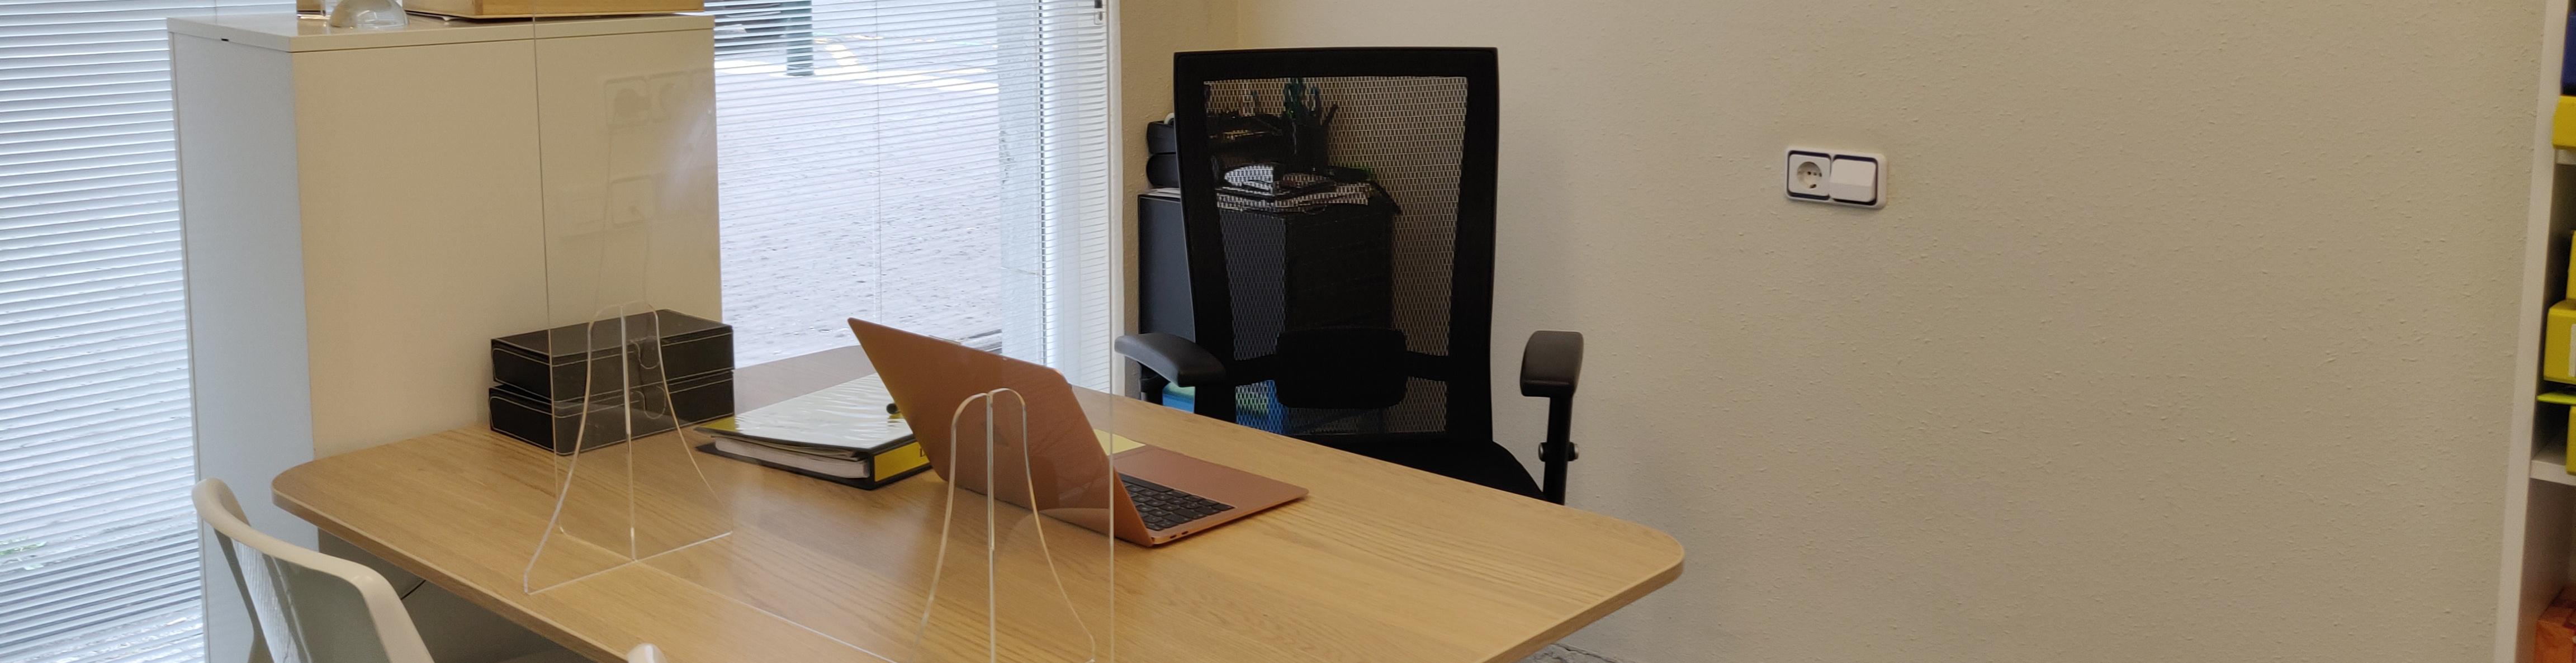 Vista de despacho